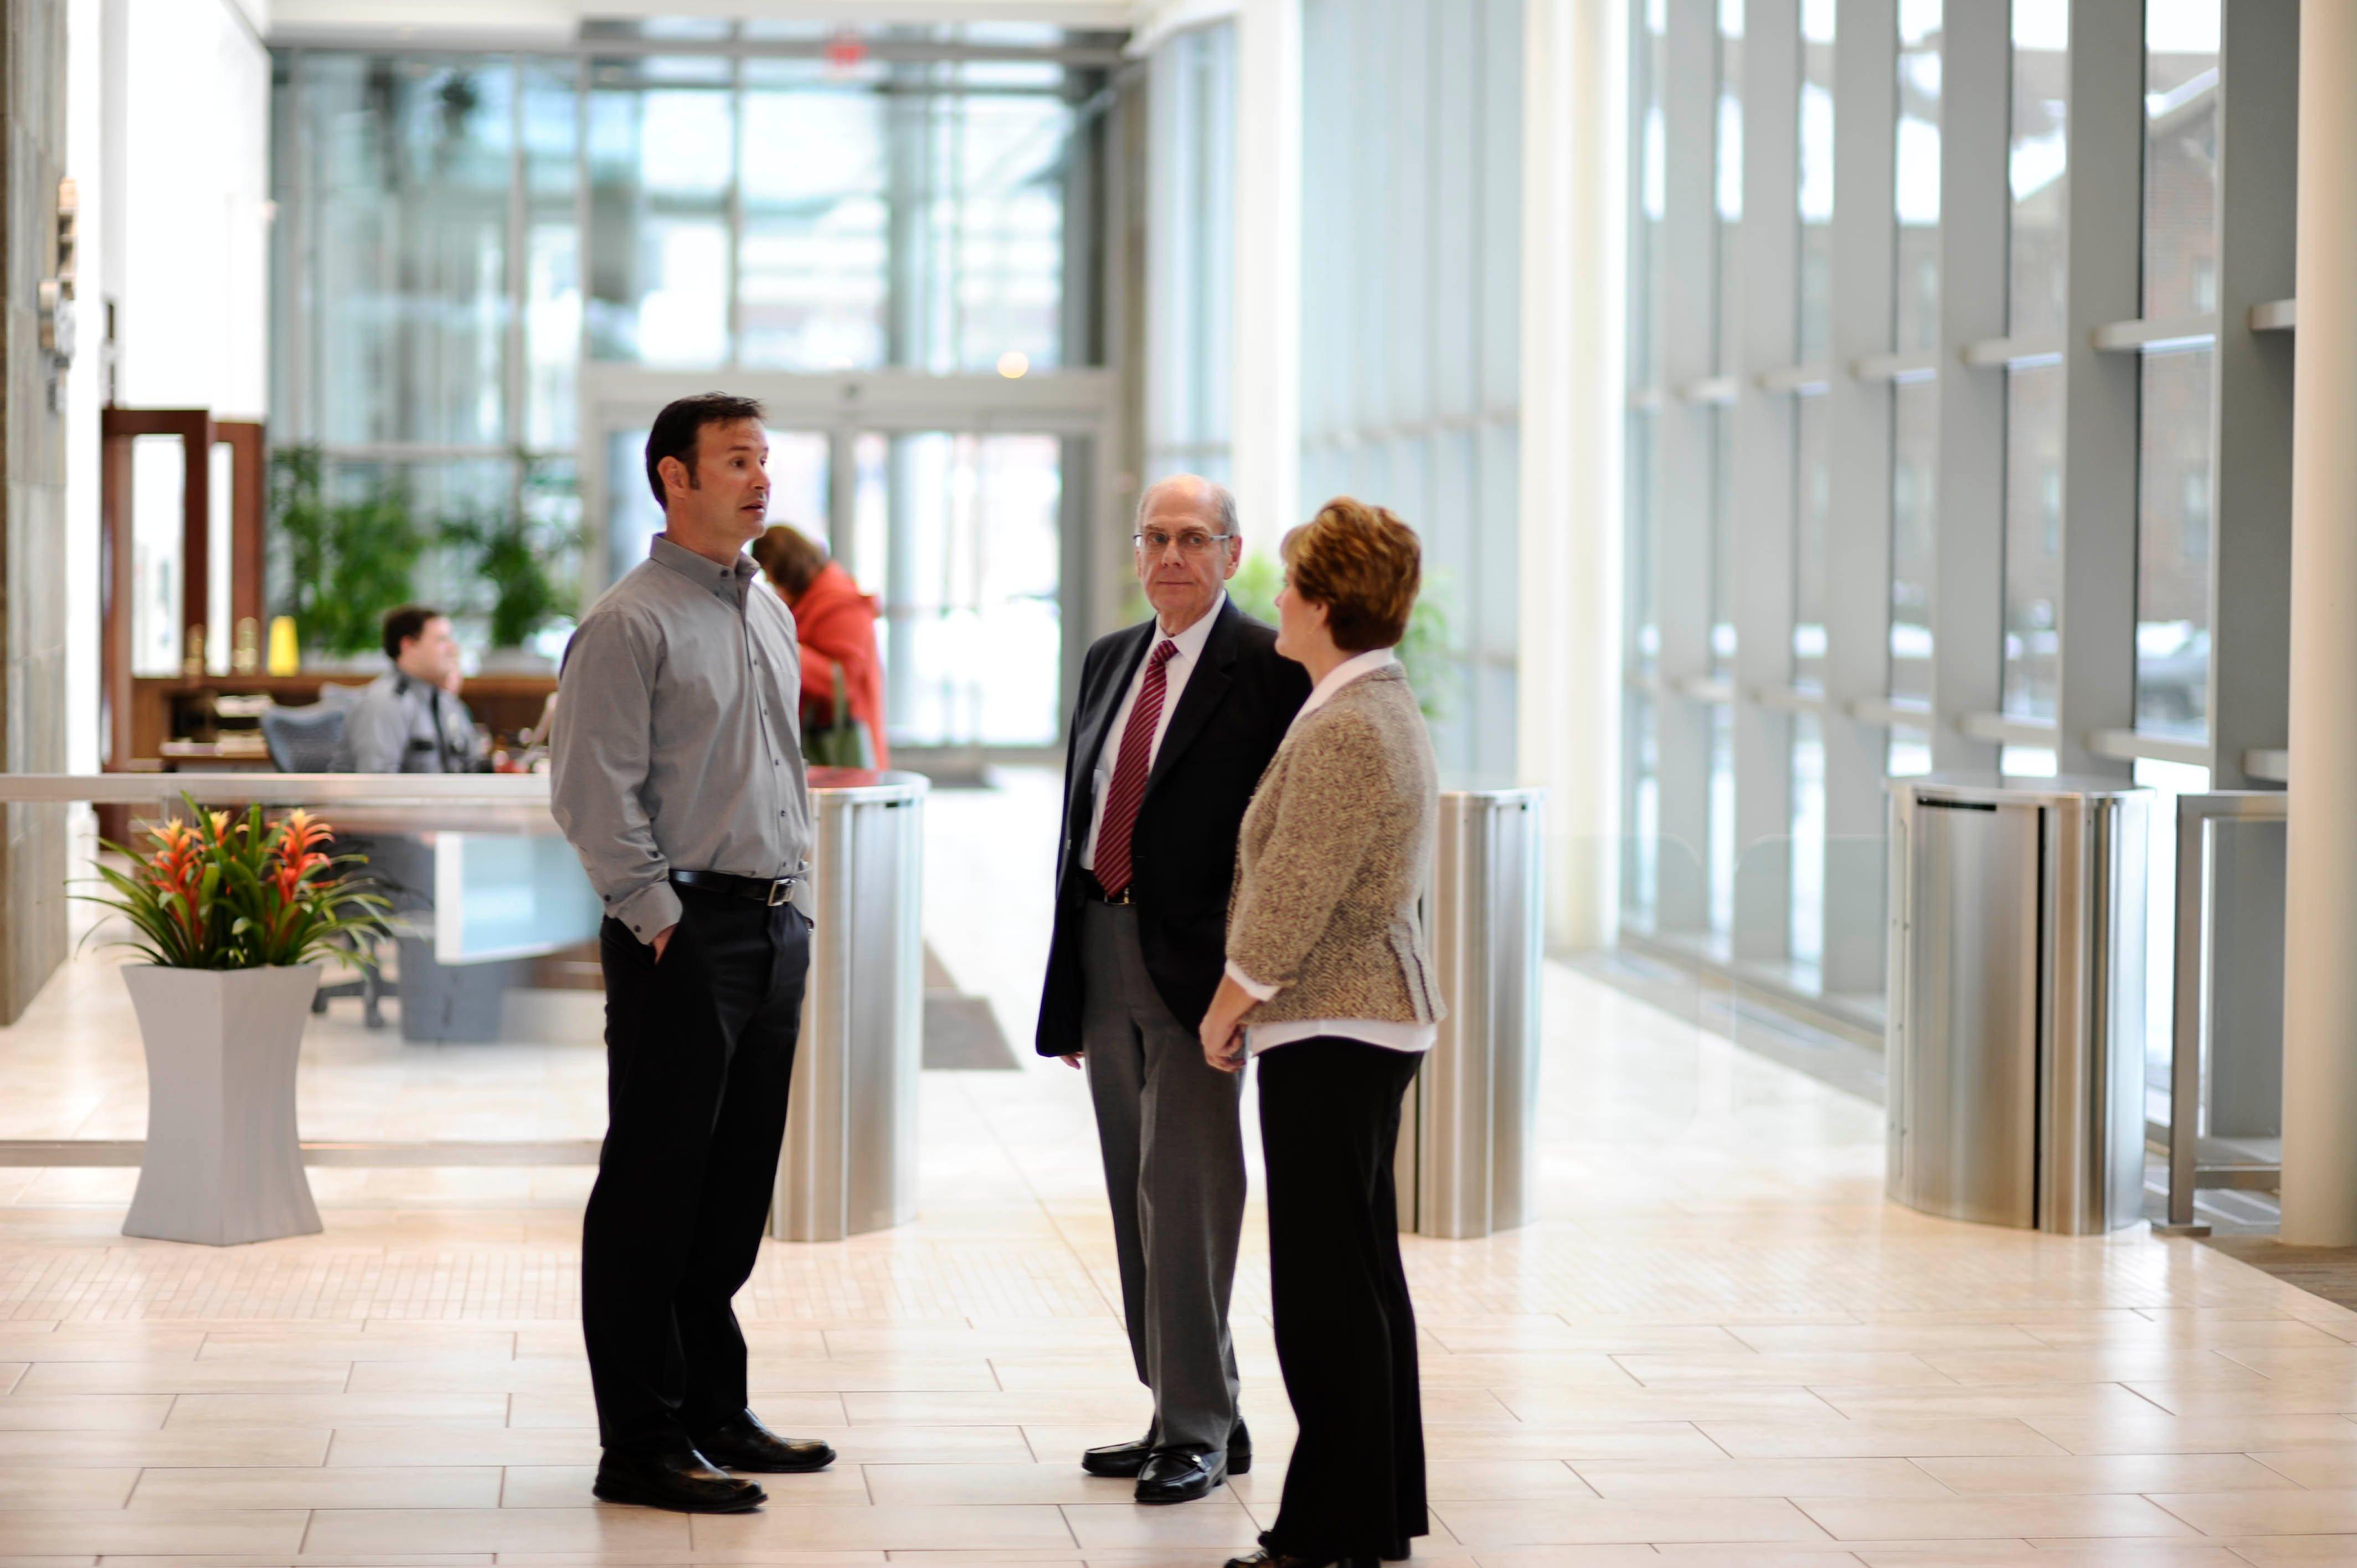 Does your manufacturer provide end user training on security entrances?